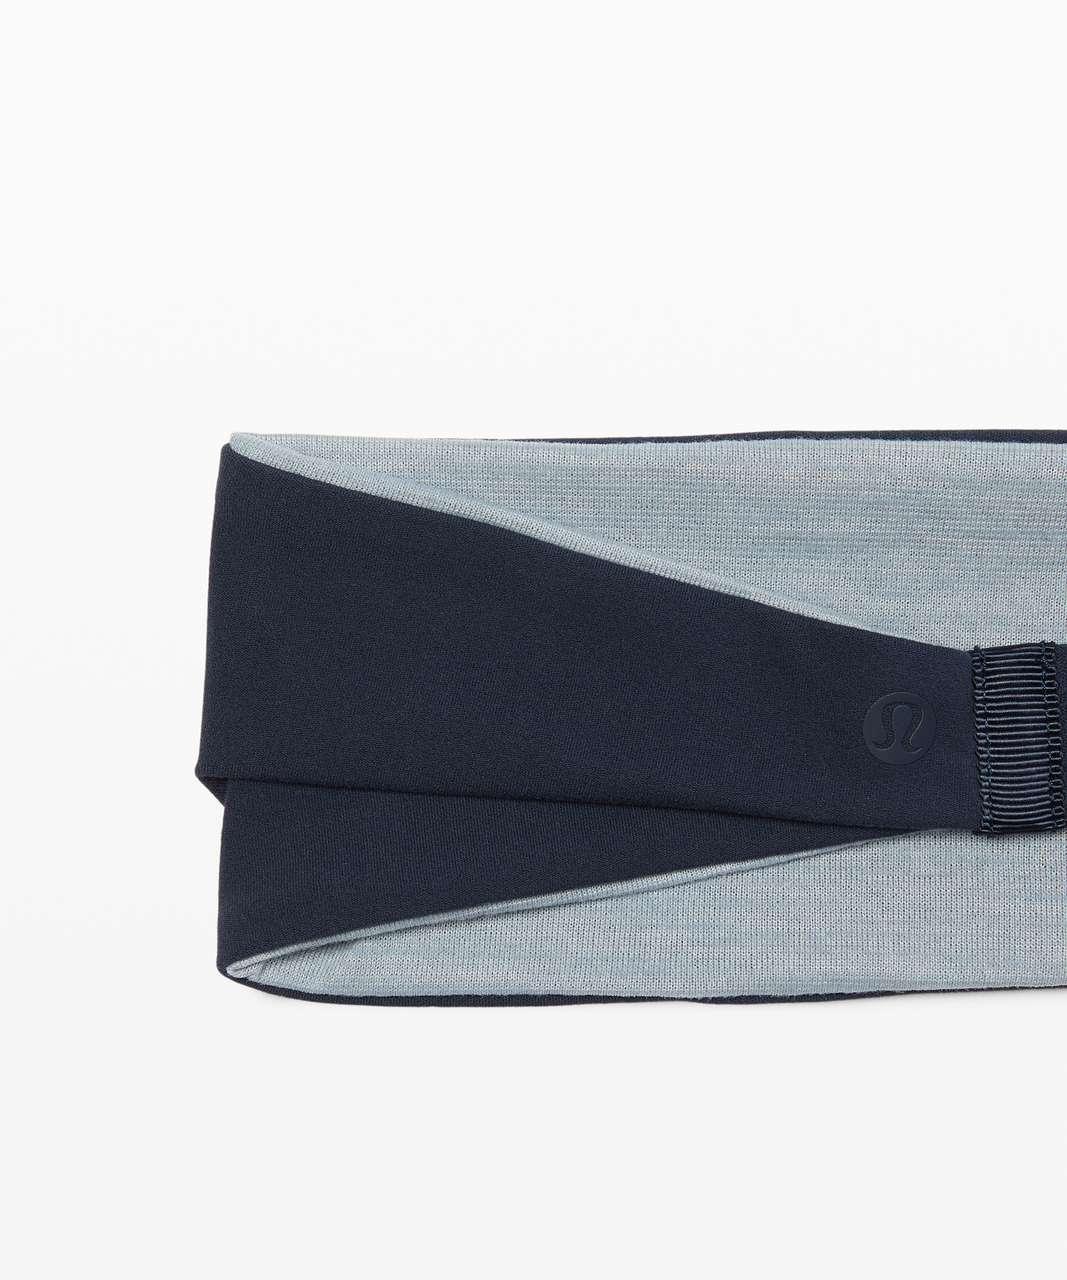 Lululemon Fringe Fighter Headband - True Navy / Heathered Blue Cast